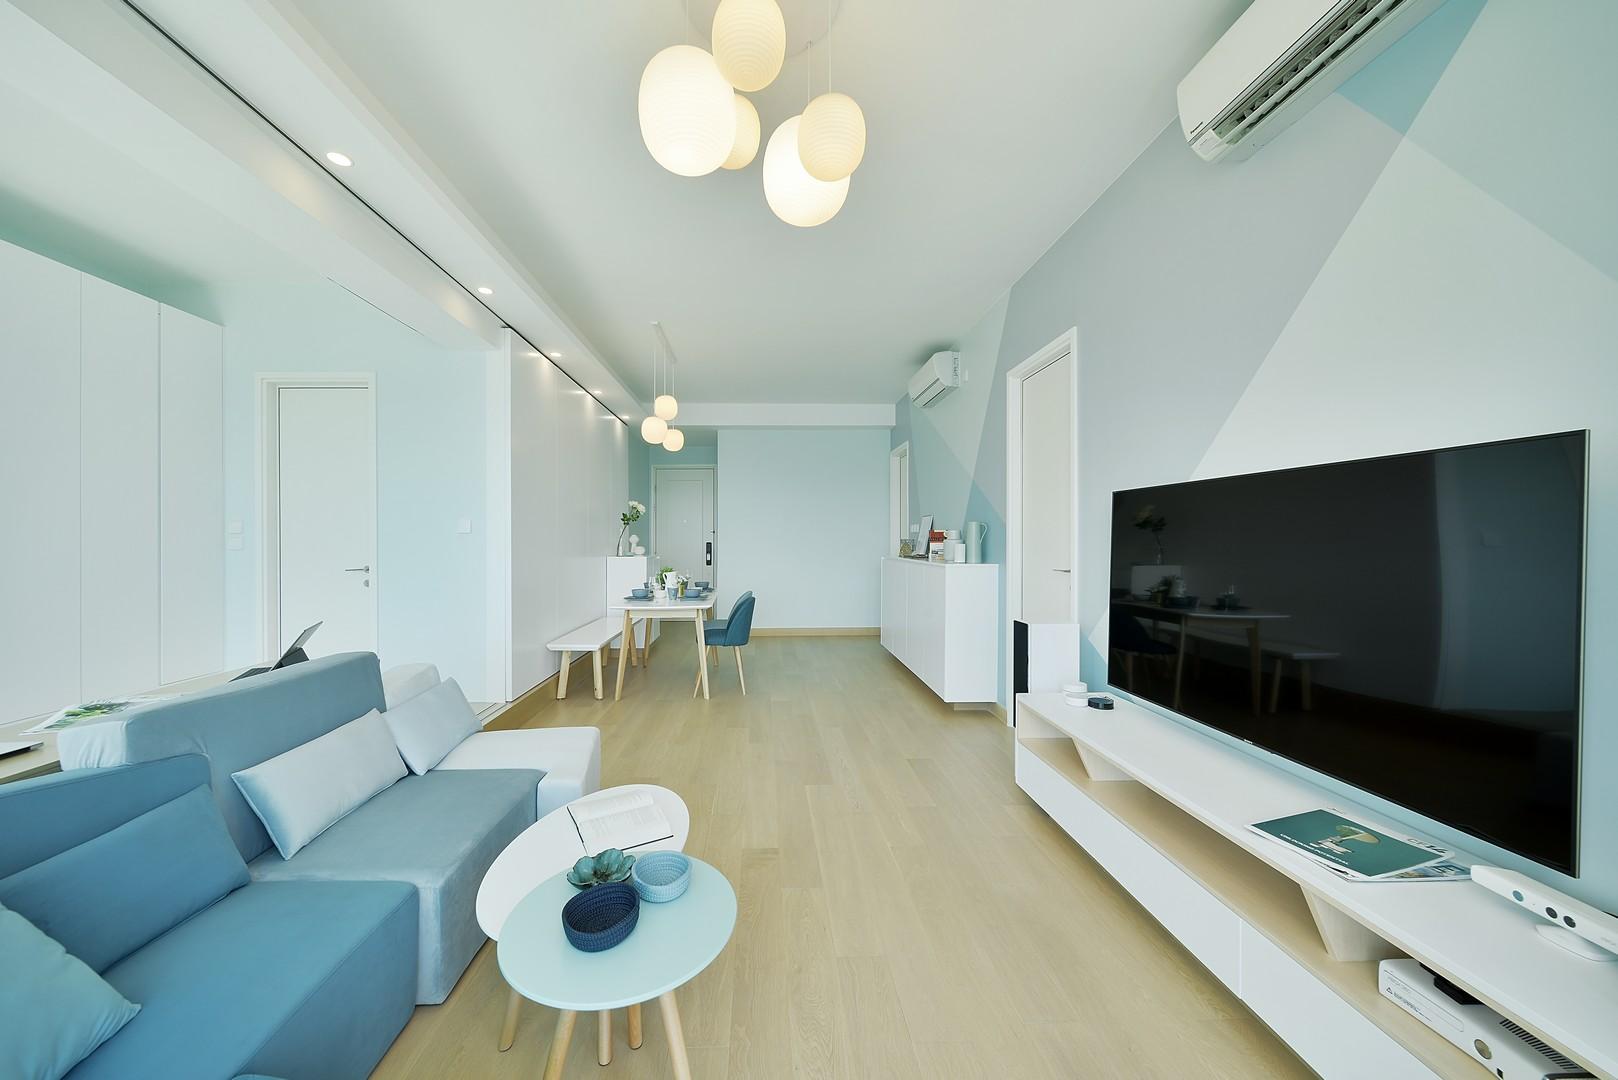 Inch Interior Design Hong Kong - The Capri 001